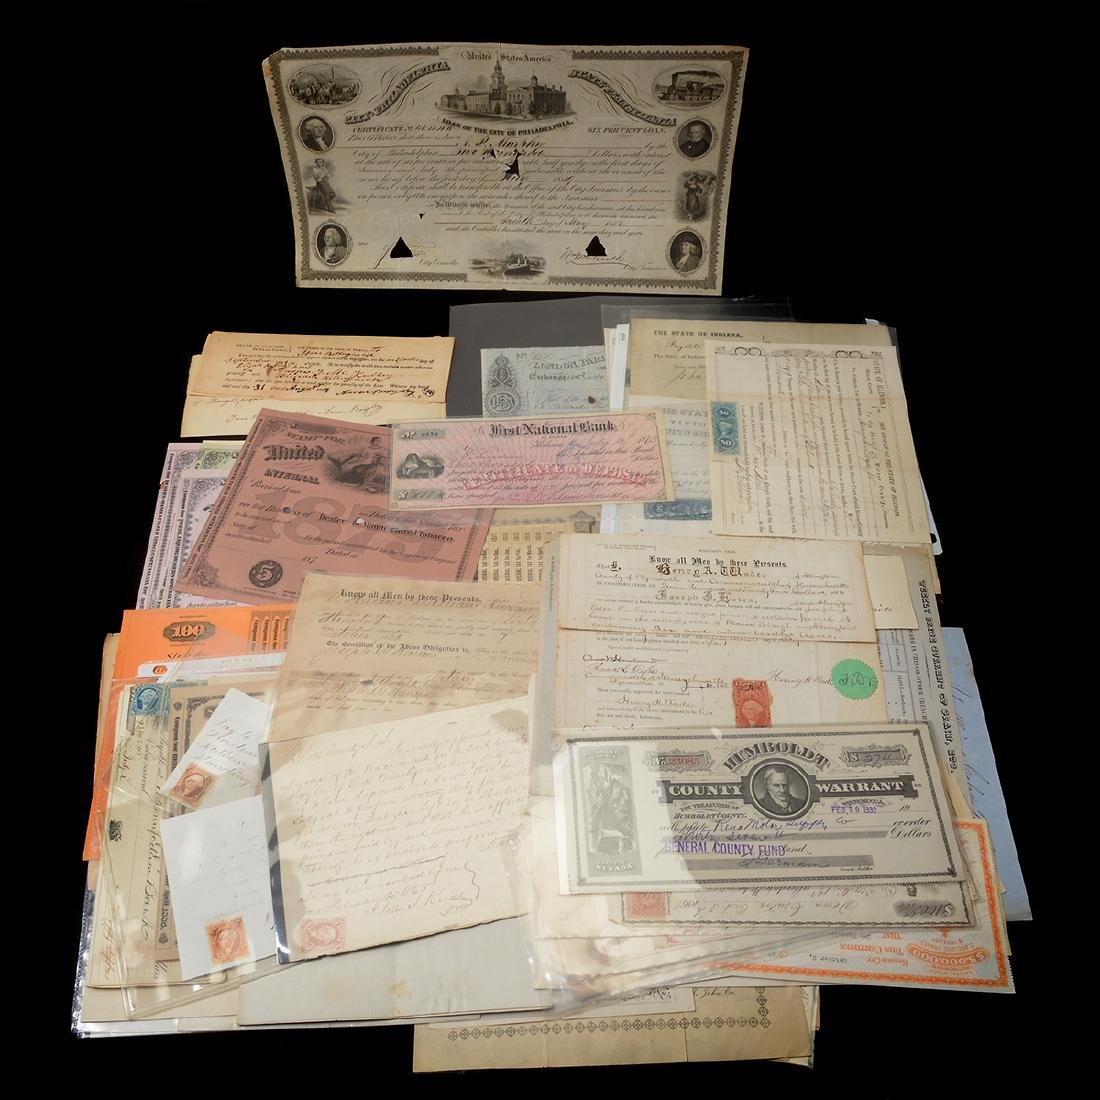 U.S Revenue Papers & Checks, 19th Century (100)